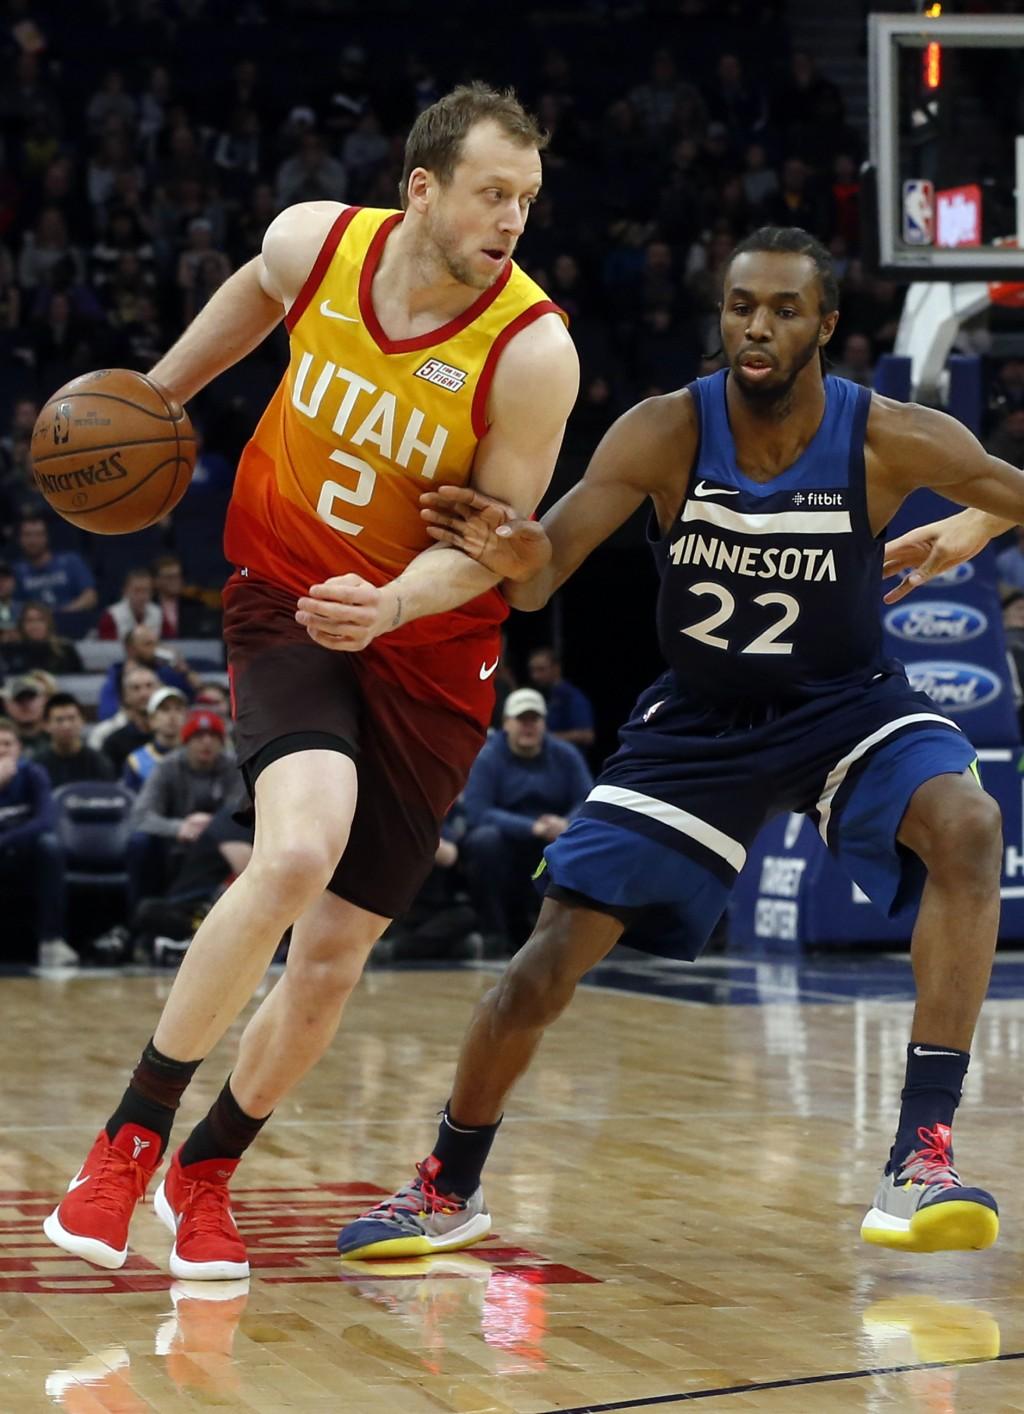 Utah Jazz's Joe Ingles, left, of Australia drives around Minnesota Timberwolves' Andrew Wiggins in the first half of an NBA basketball game Sunday, Ja...